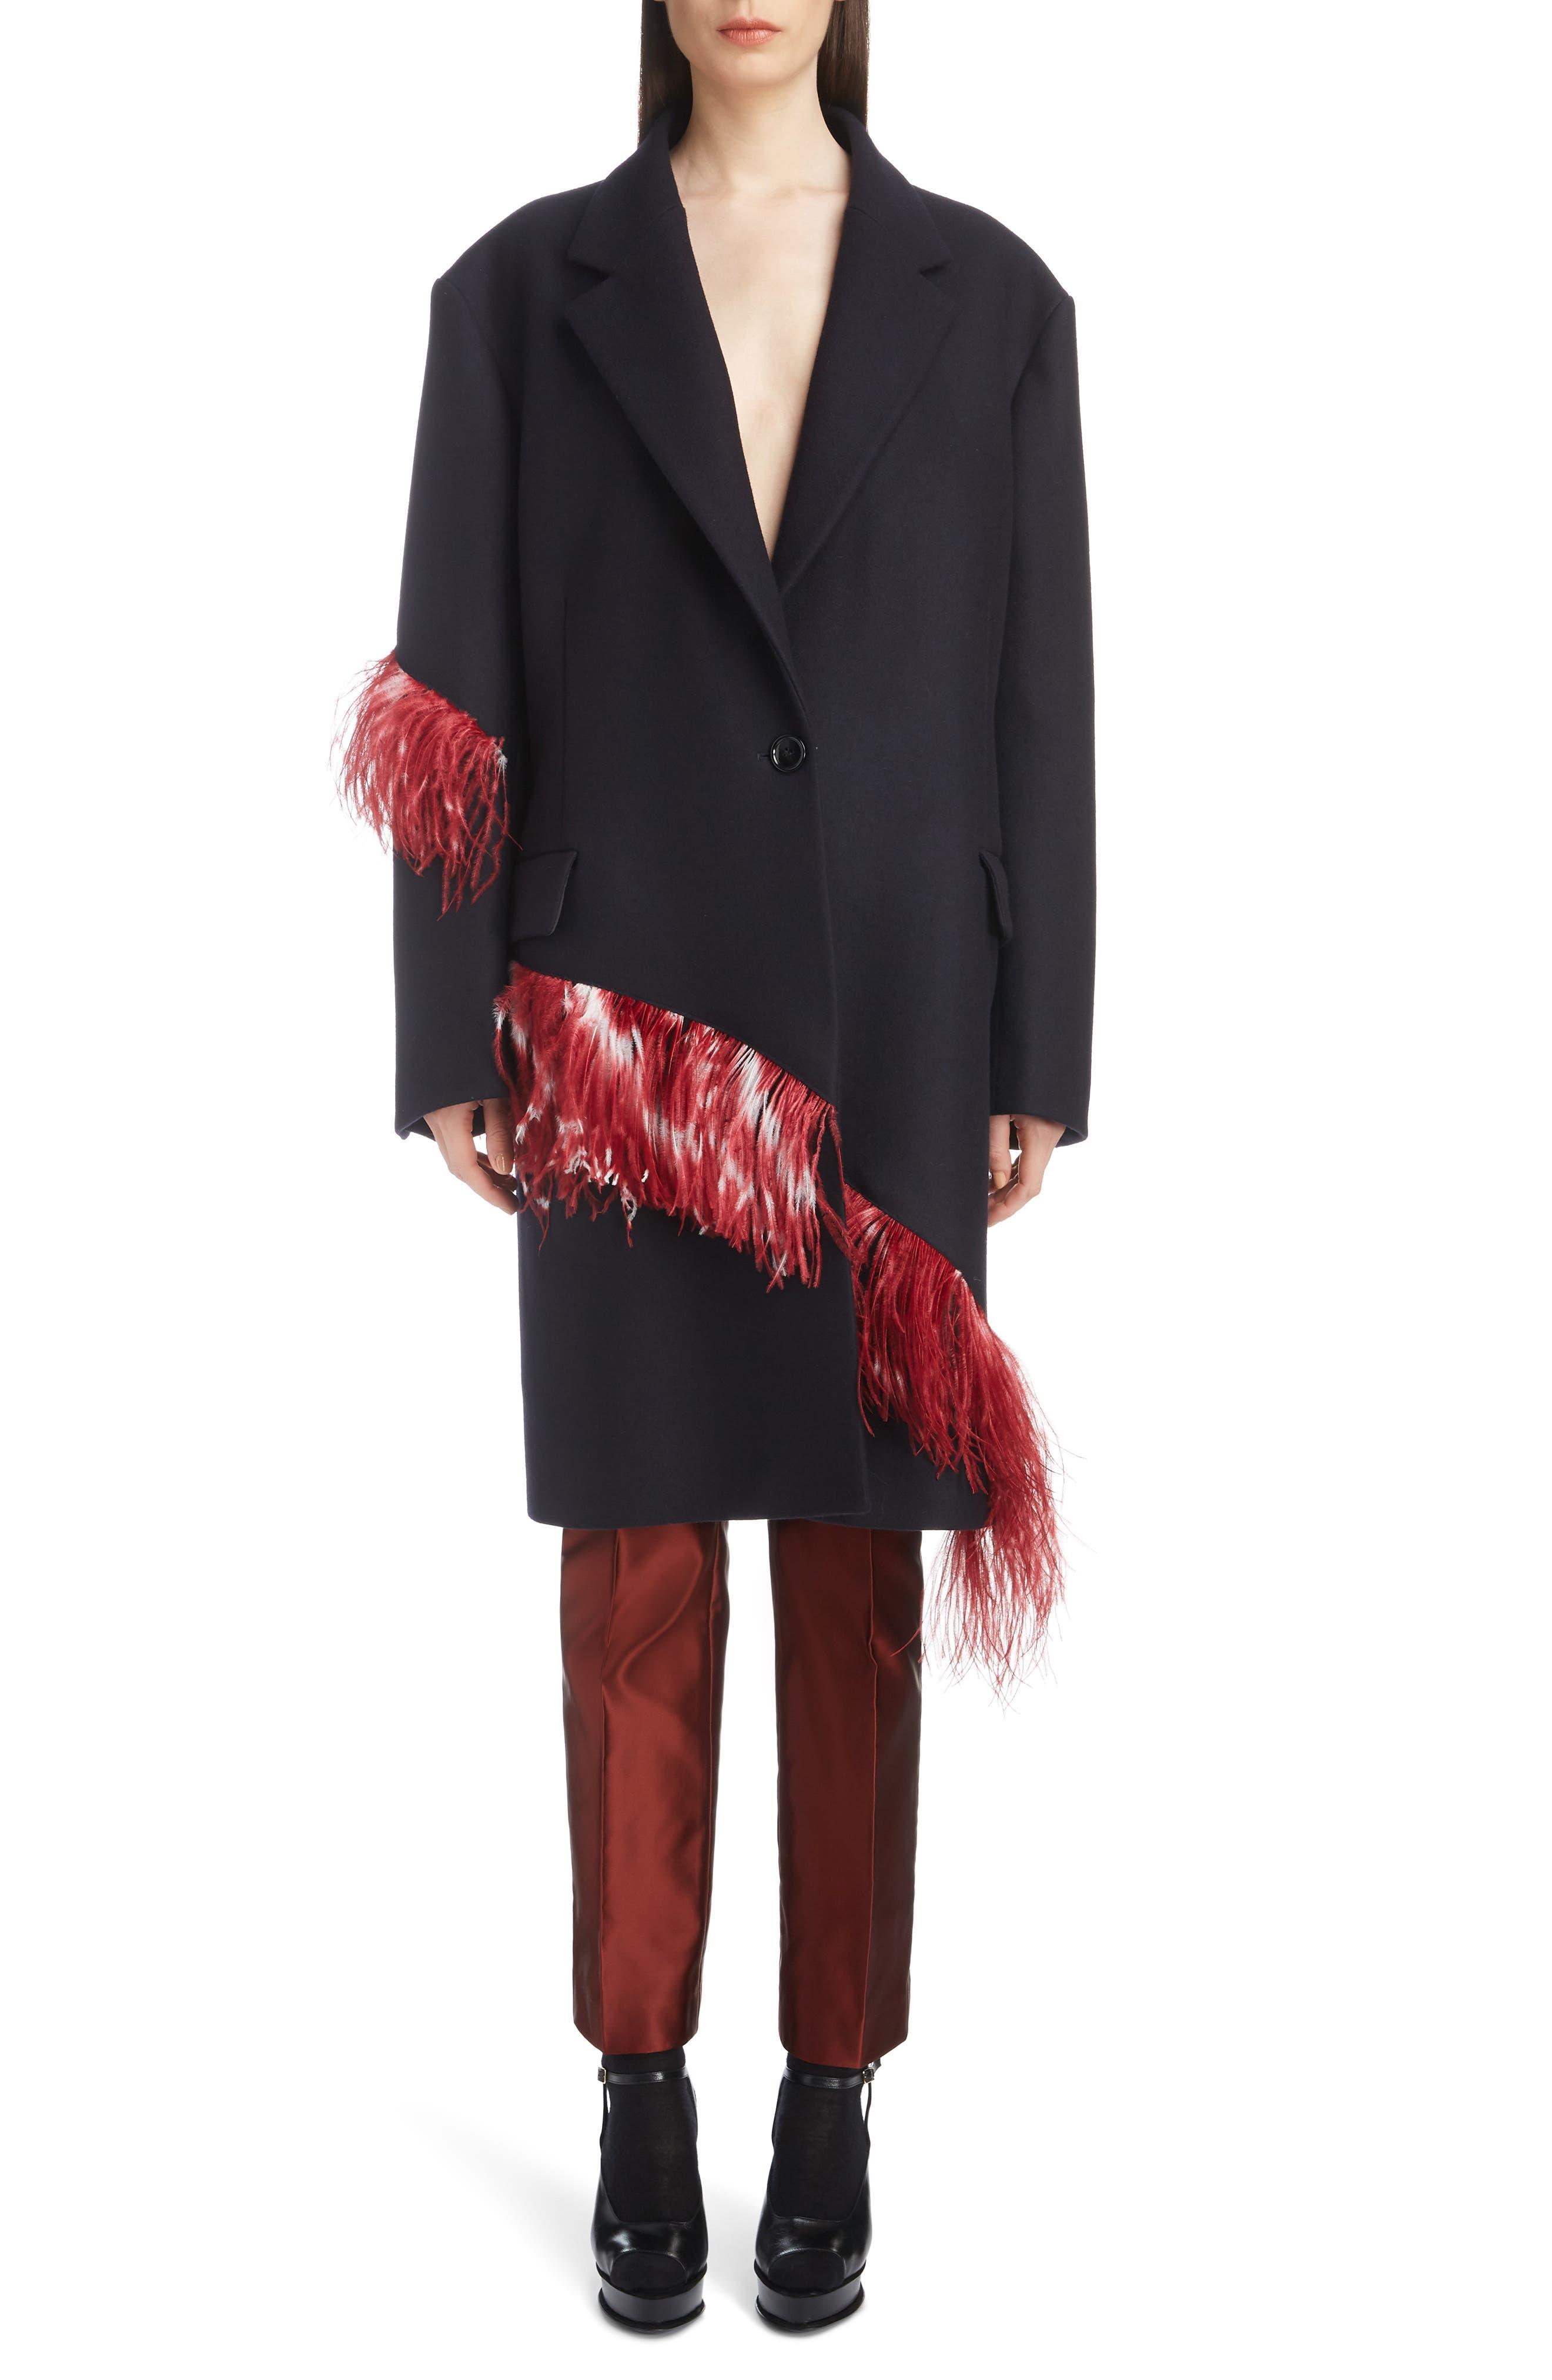 DRIES VAN NOTEN,                             Ostrich Feather Trim Wool Blend Reefer Coat,                             Alternate thumbnail 6, color,                             421